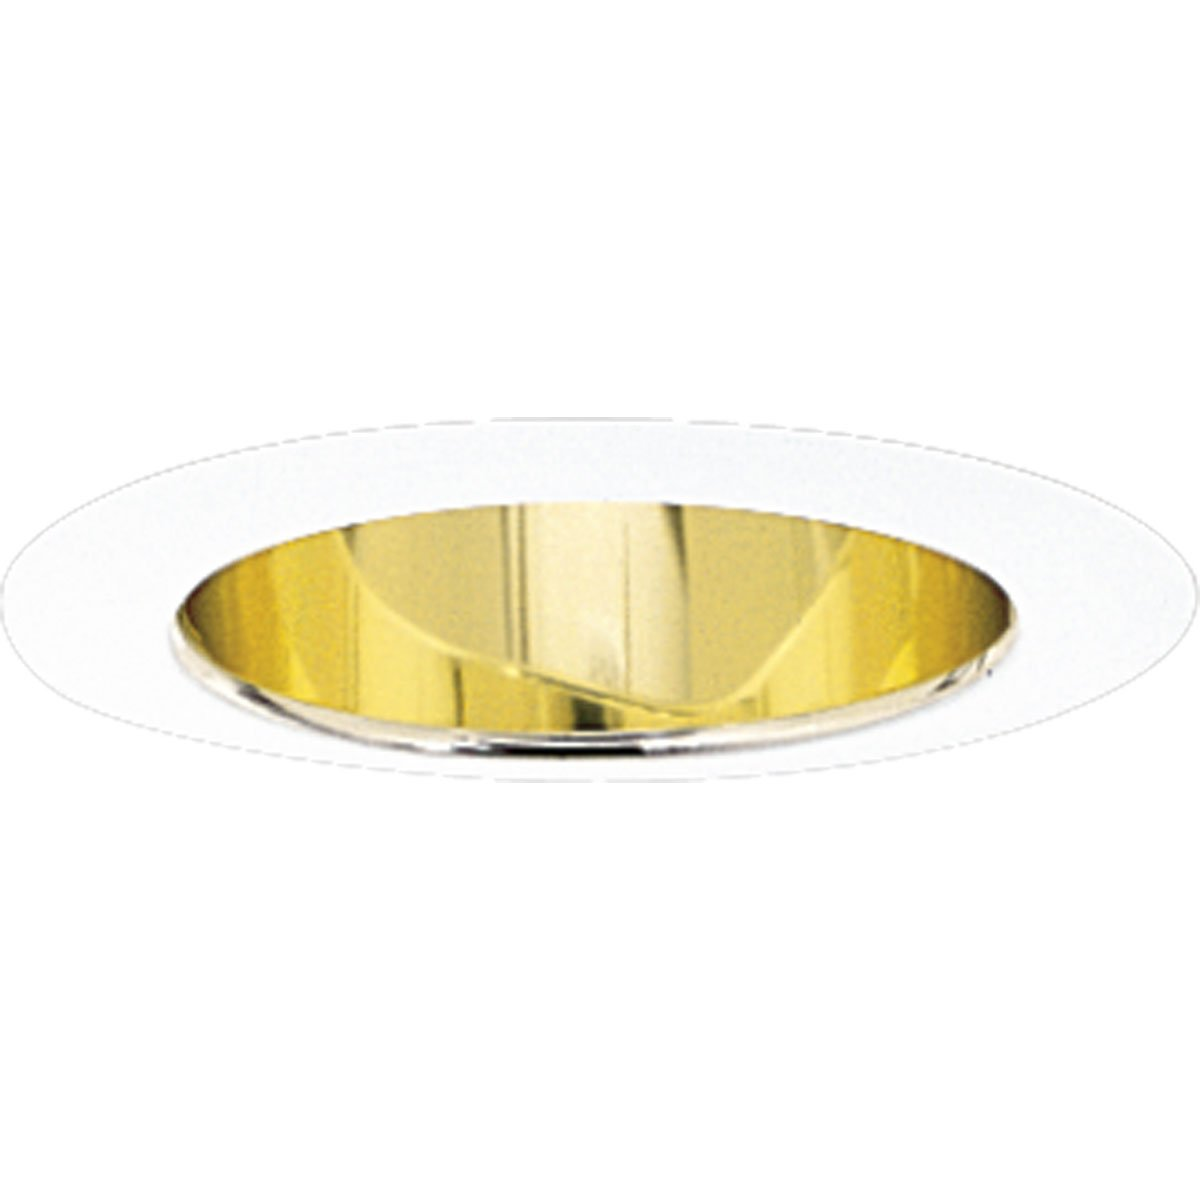 Progress Lighting P8172-22A Gold Alzak Finish 5-Inch Deep Cone, Gold Alzak